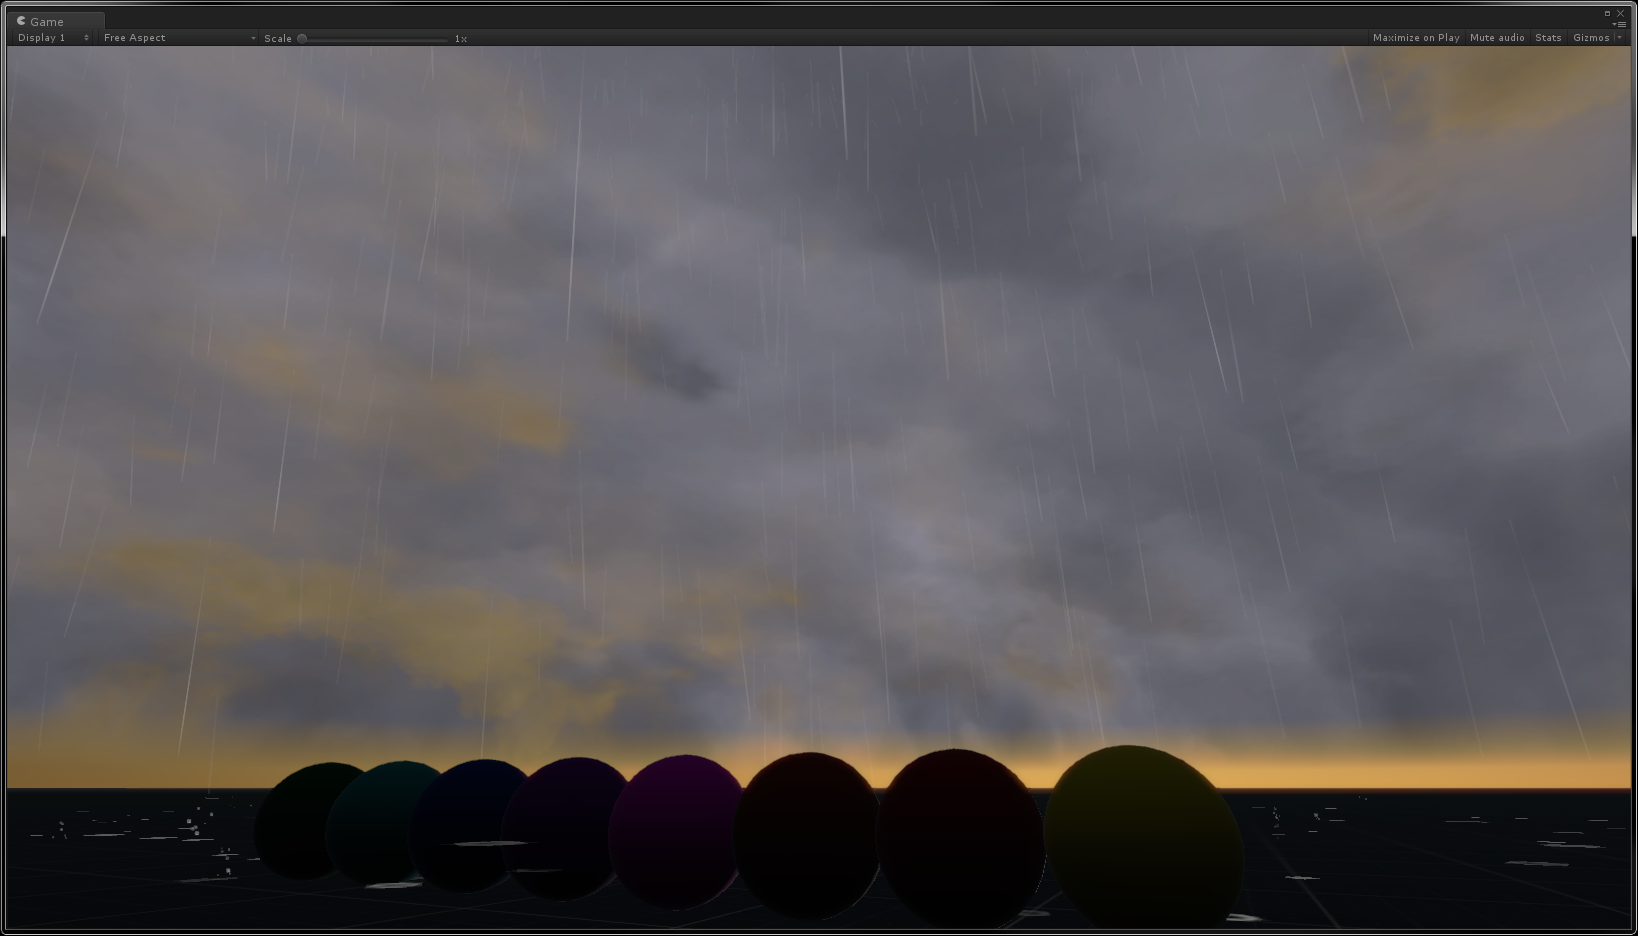 Genesis Weather Raining 0530.png